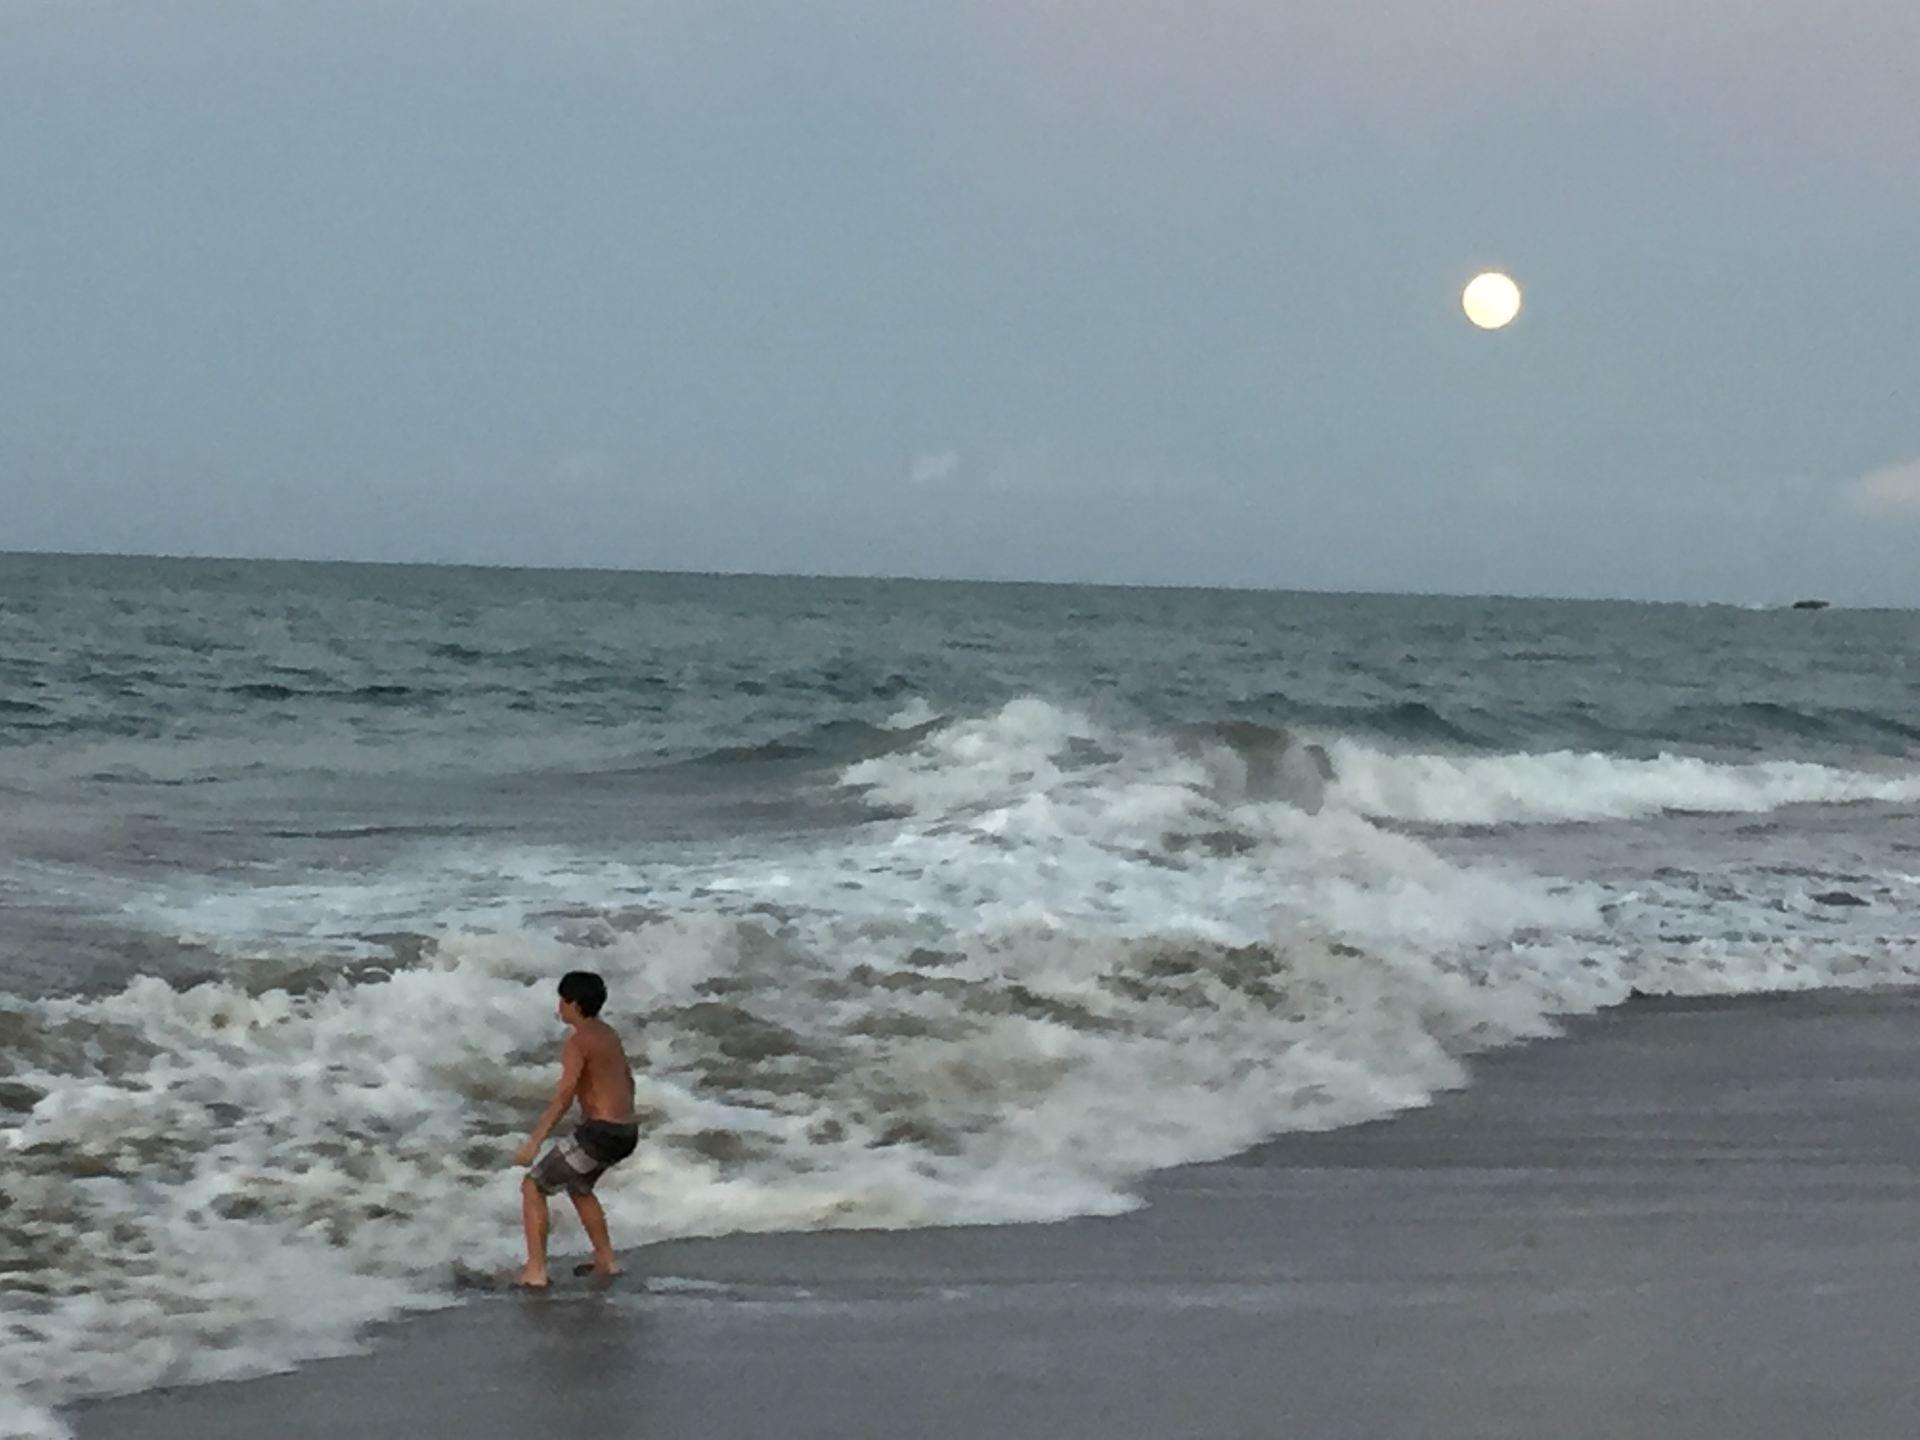 Puerto Rico, waves, San Juan